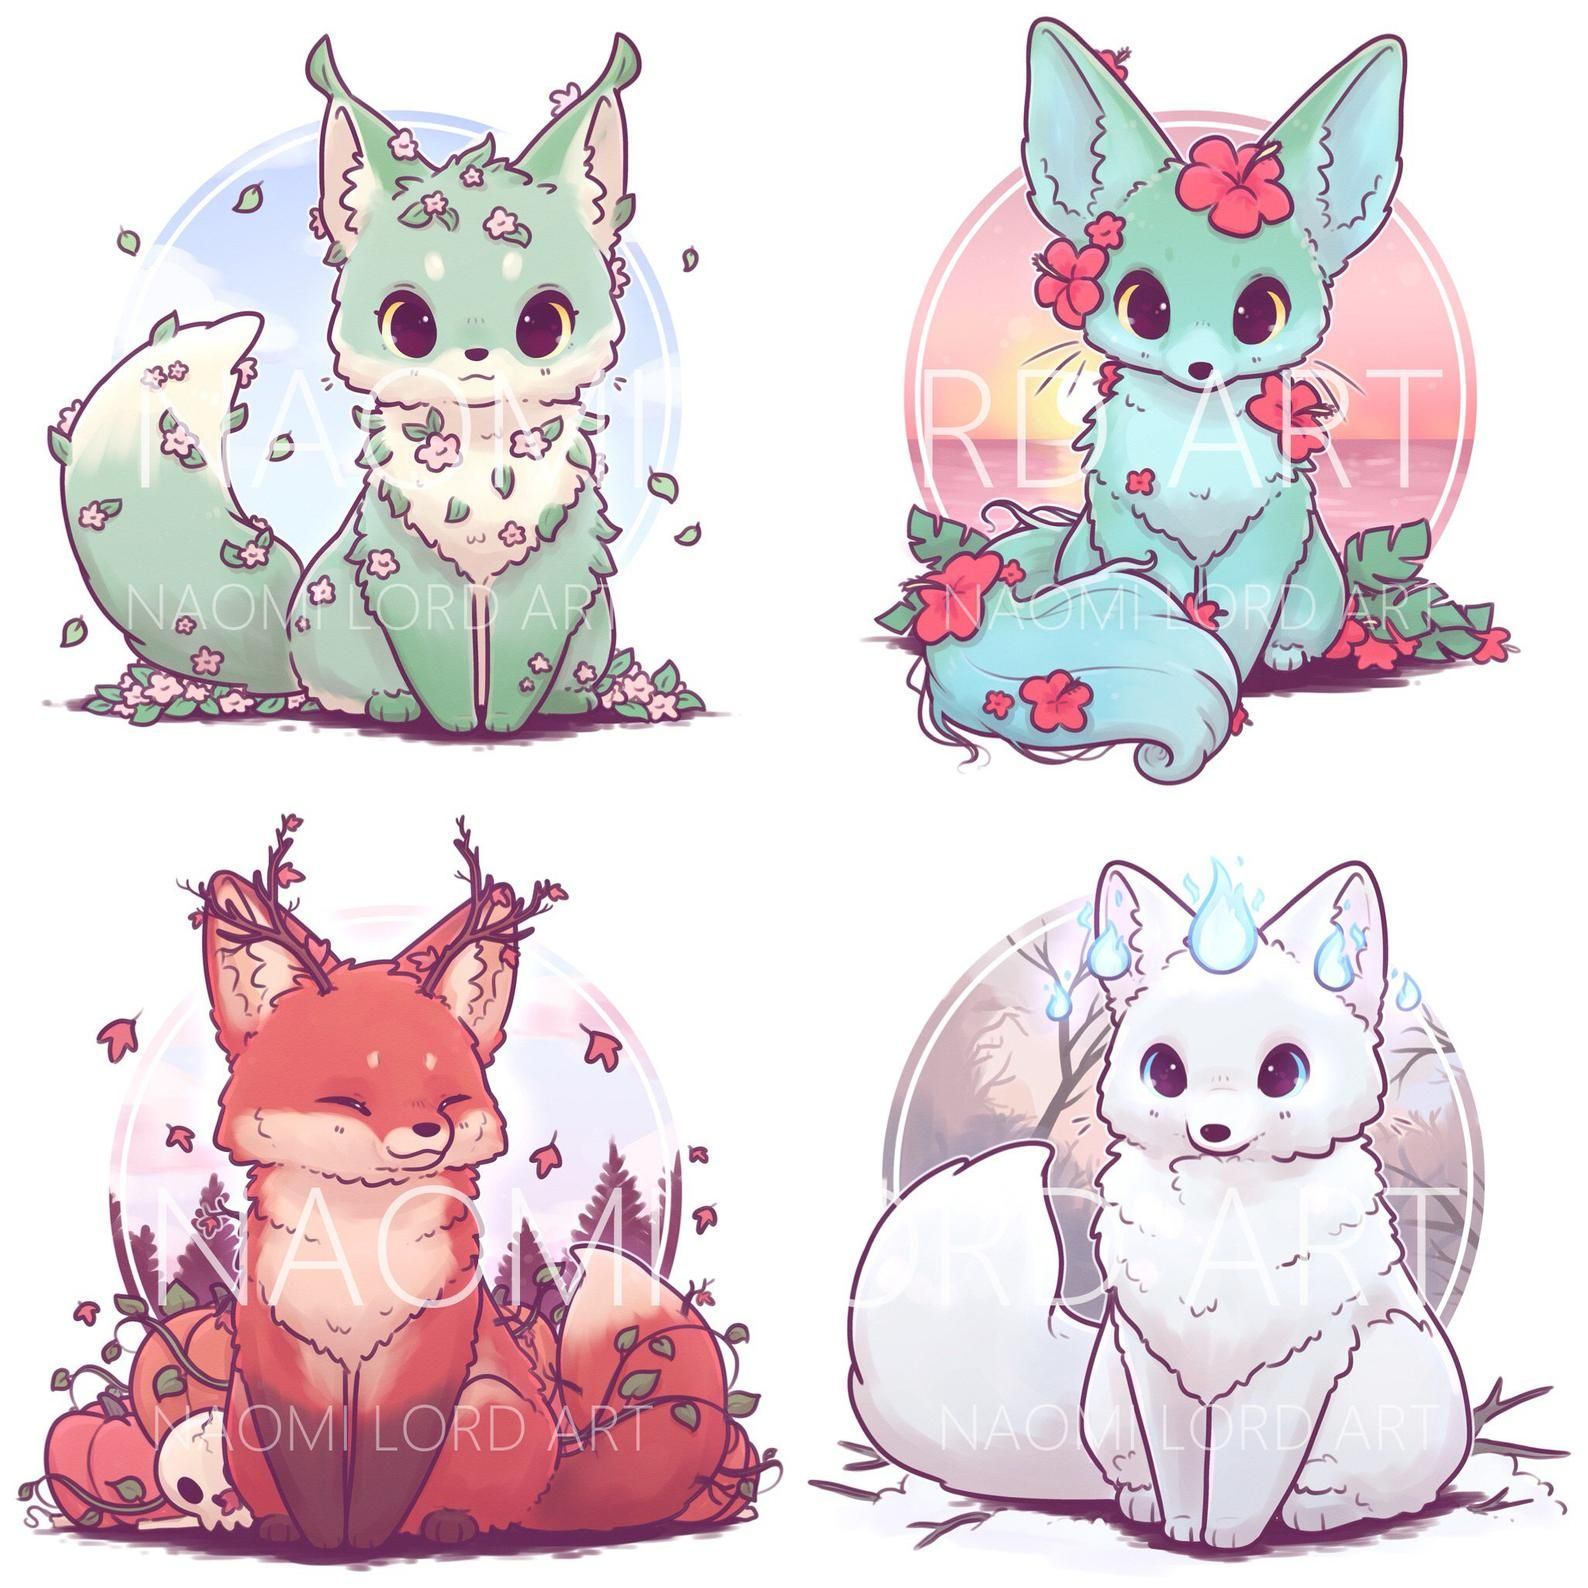 Seasonal Foxes Stickers And Or Prints 6x6 Or 8x8 Etsy In 2020 Cute Animal Drawings Kawaii Cute Fox Drawing Cute Animal Drawings